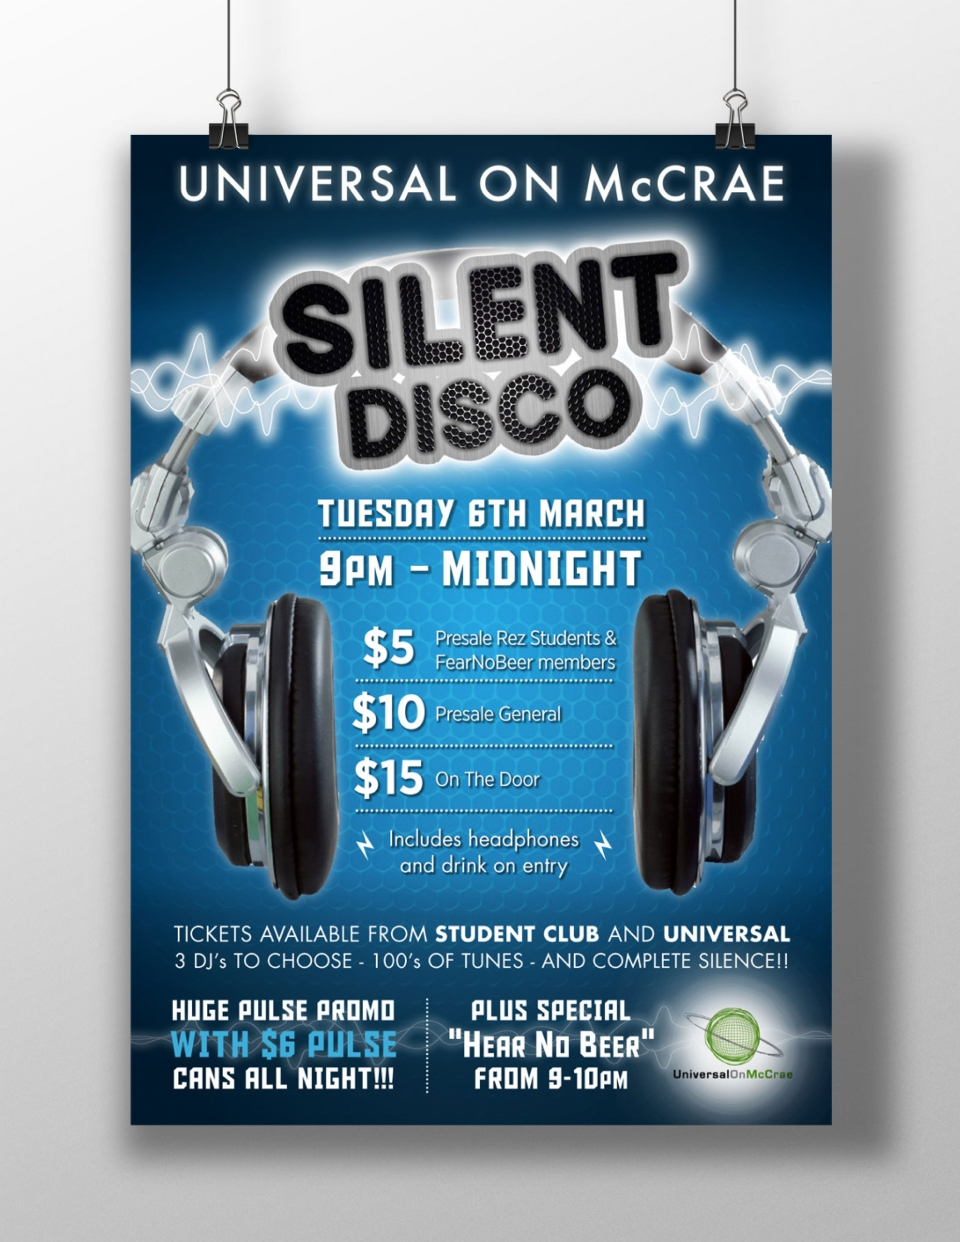 Universal_Nightclub_04